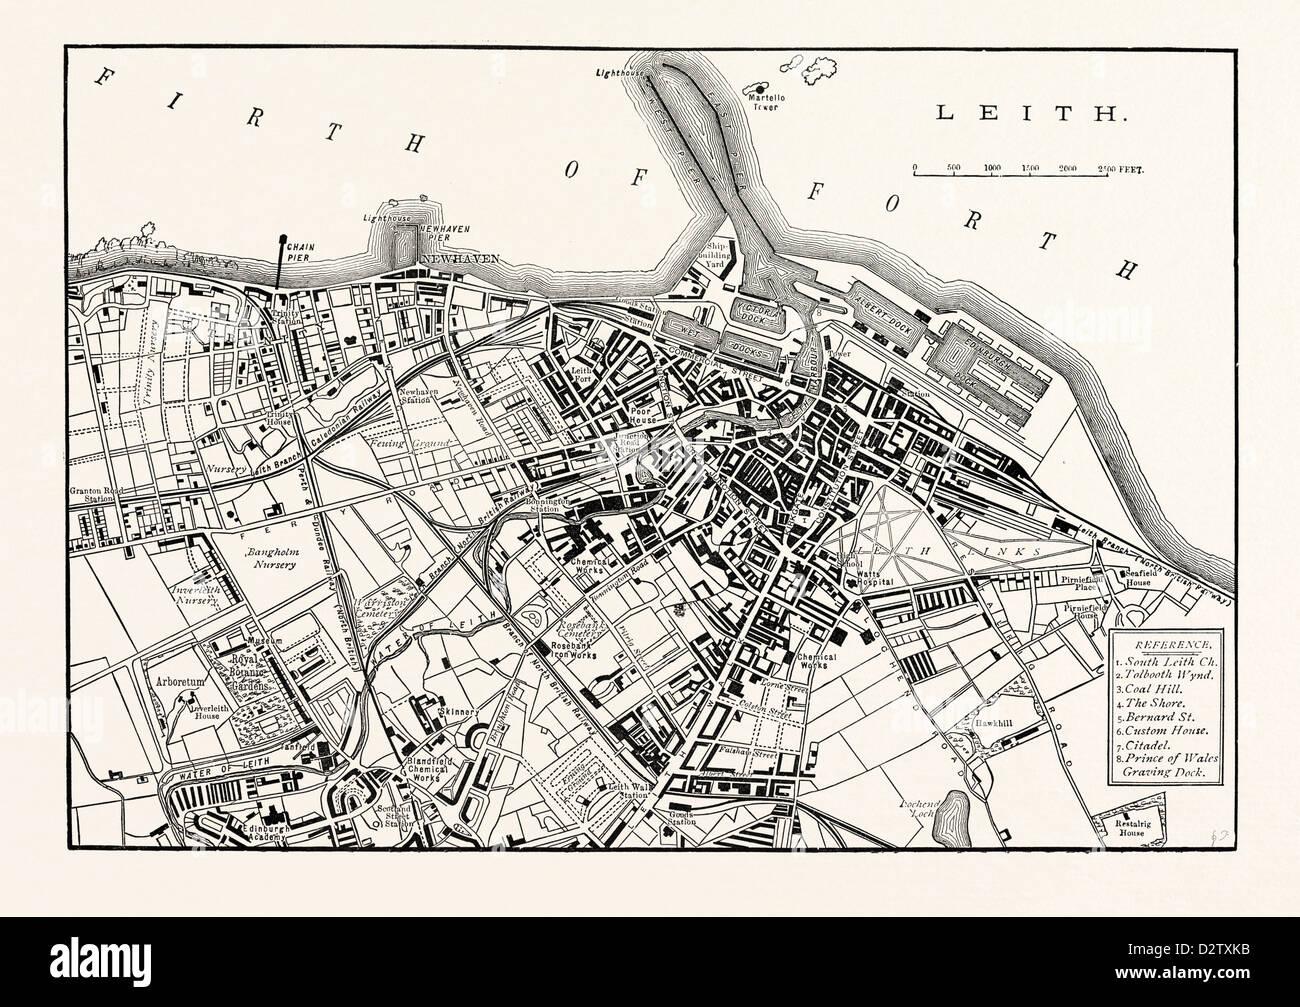 EDINBURGH: PLAN OF LEITH 1883 - Stock Image